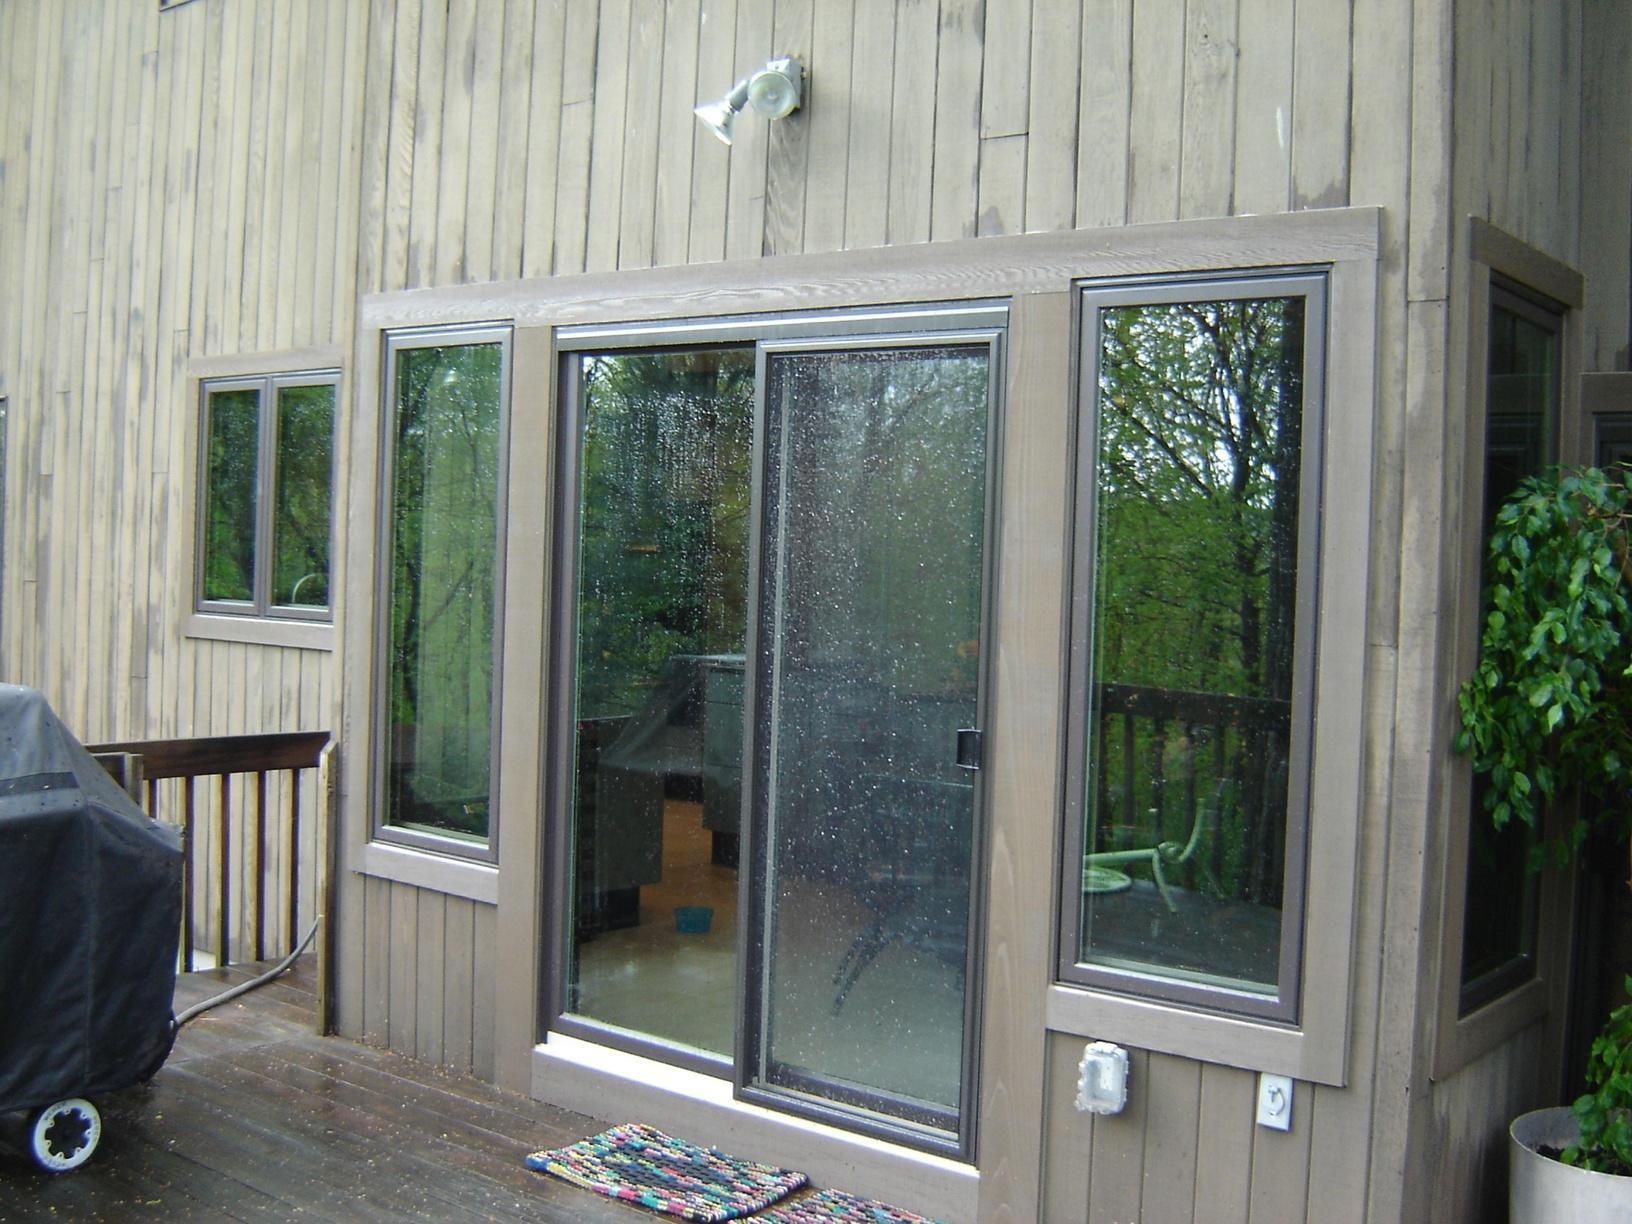 Sliding Door and Window Installation in Wycoff, NJ